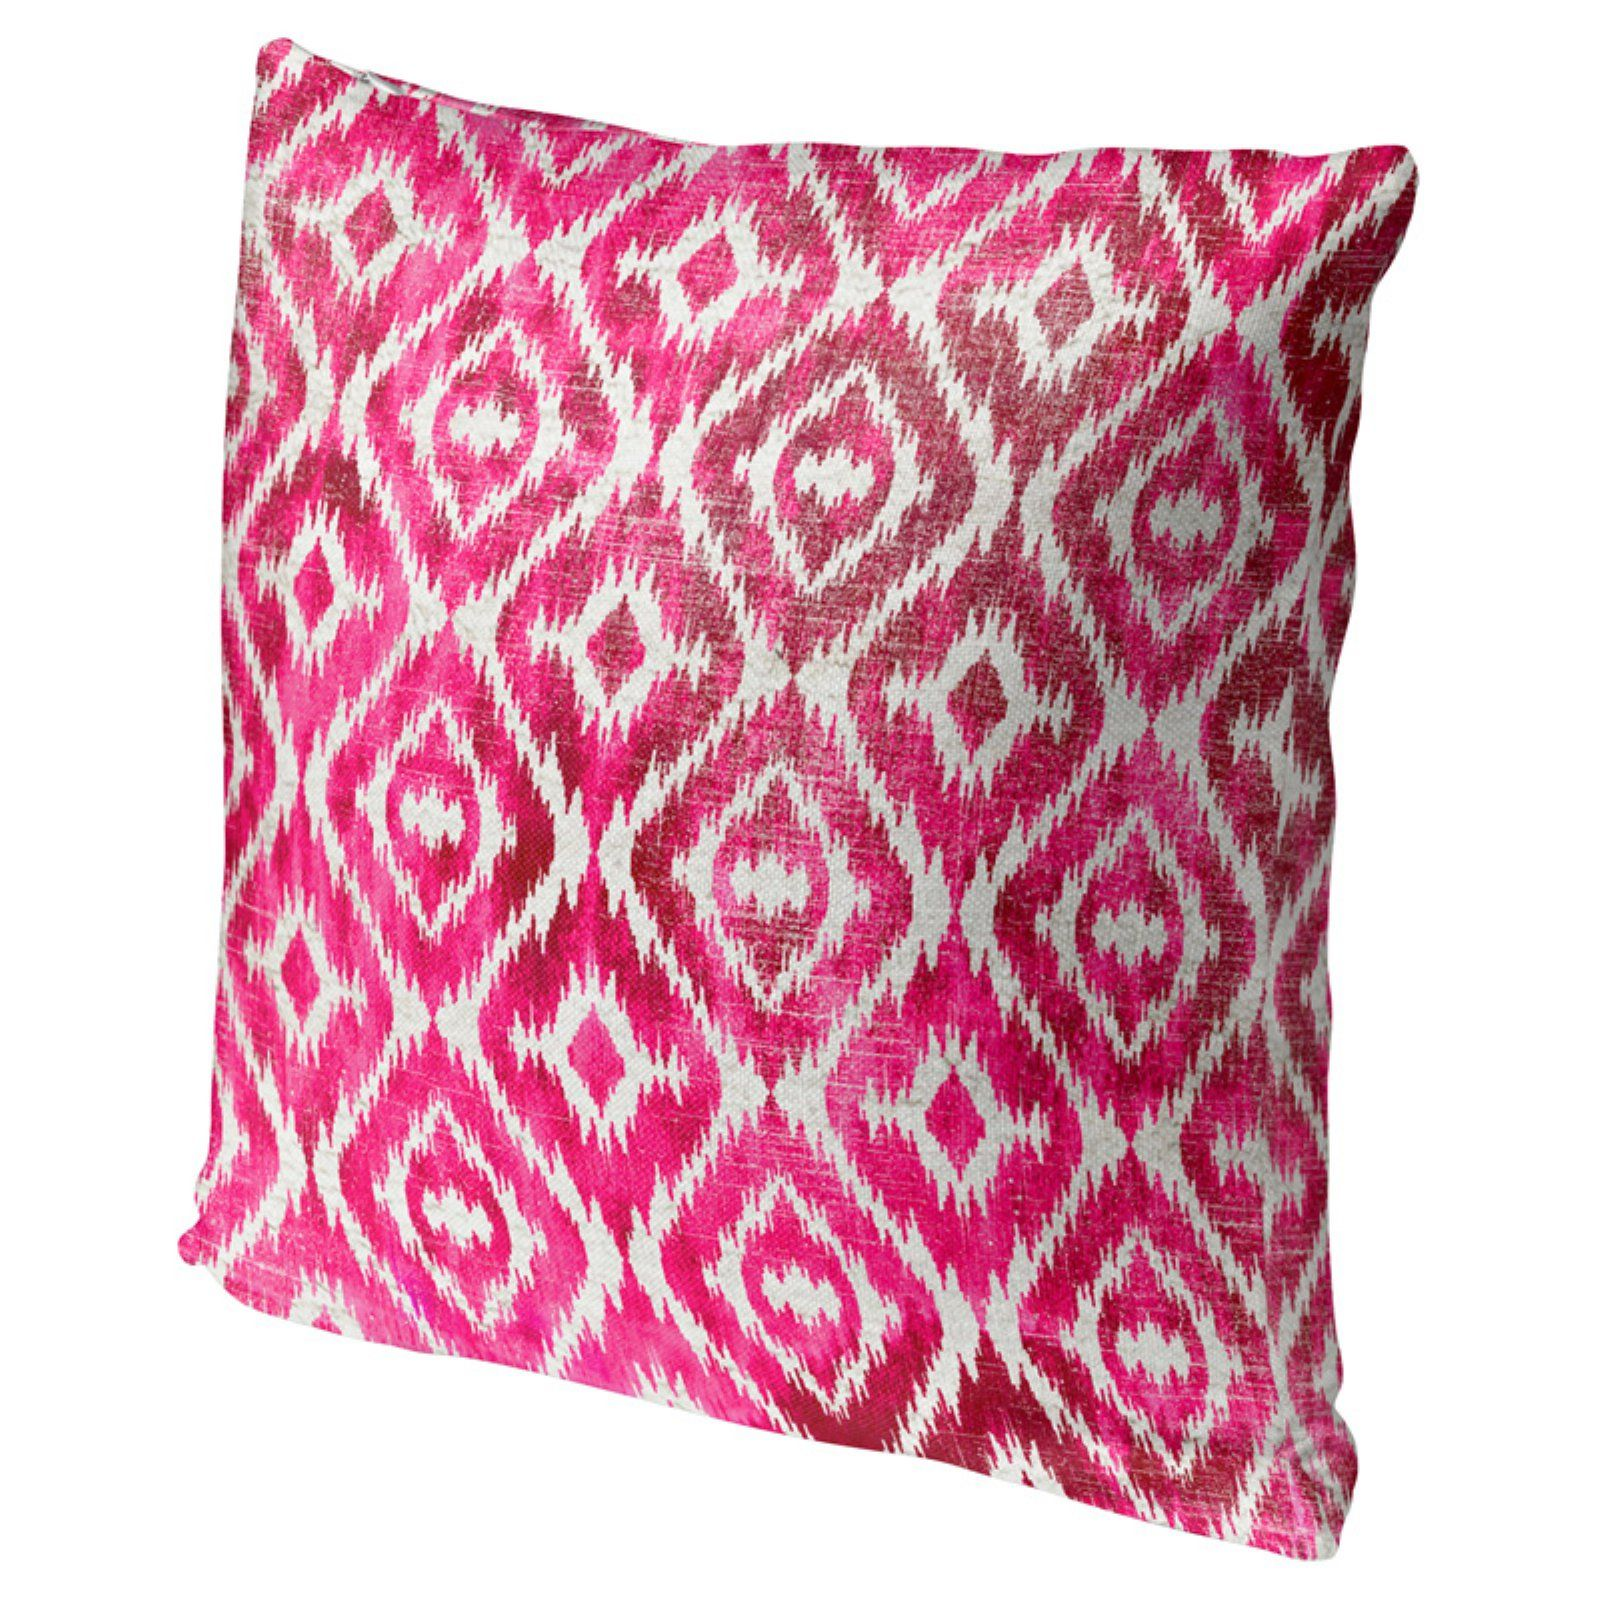 Kavka Designs Omari Gray Accent Pillow Pink